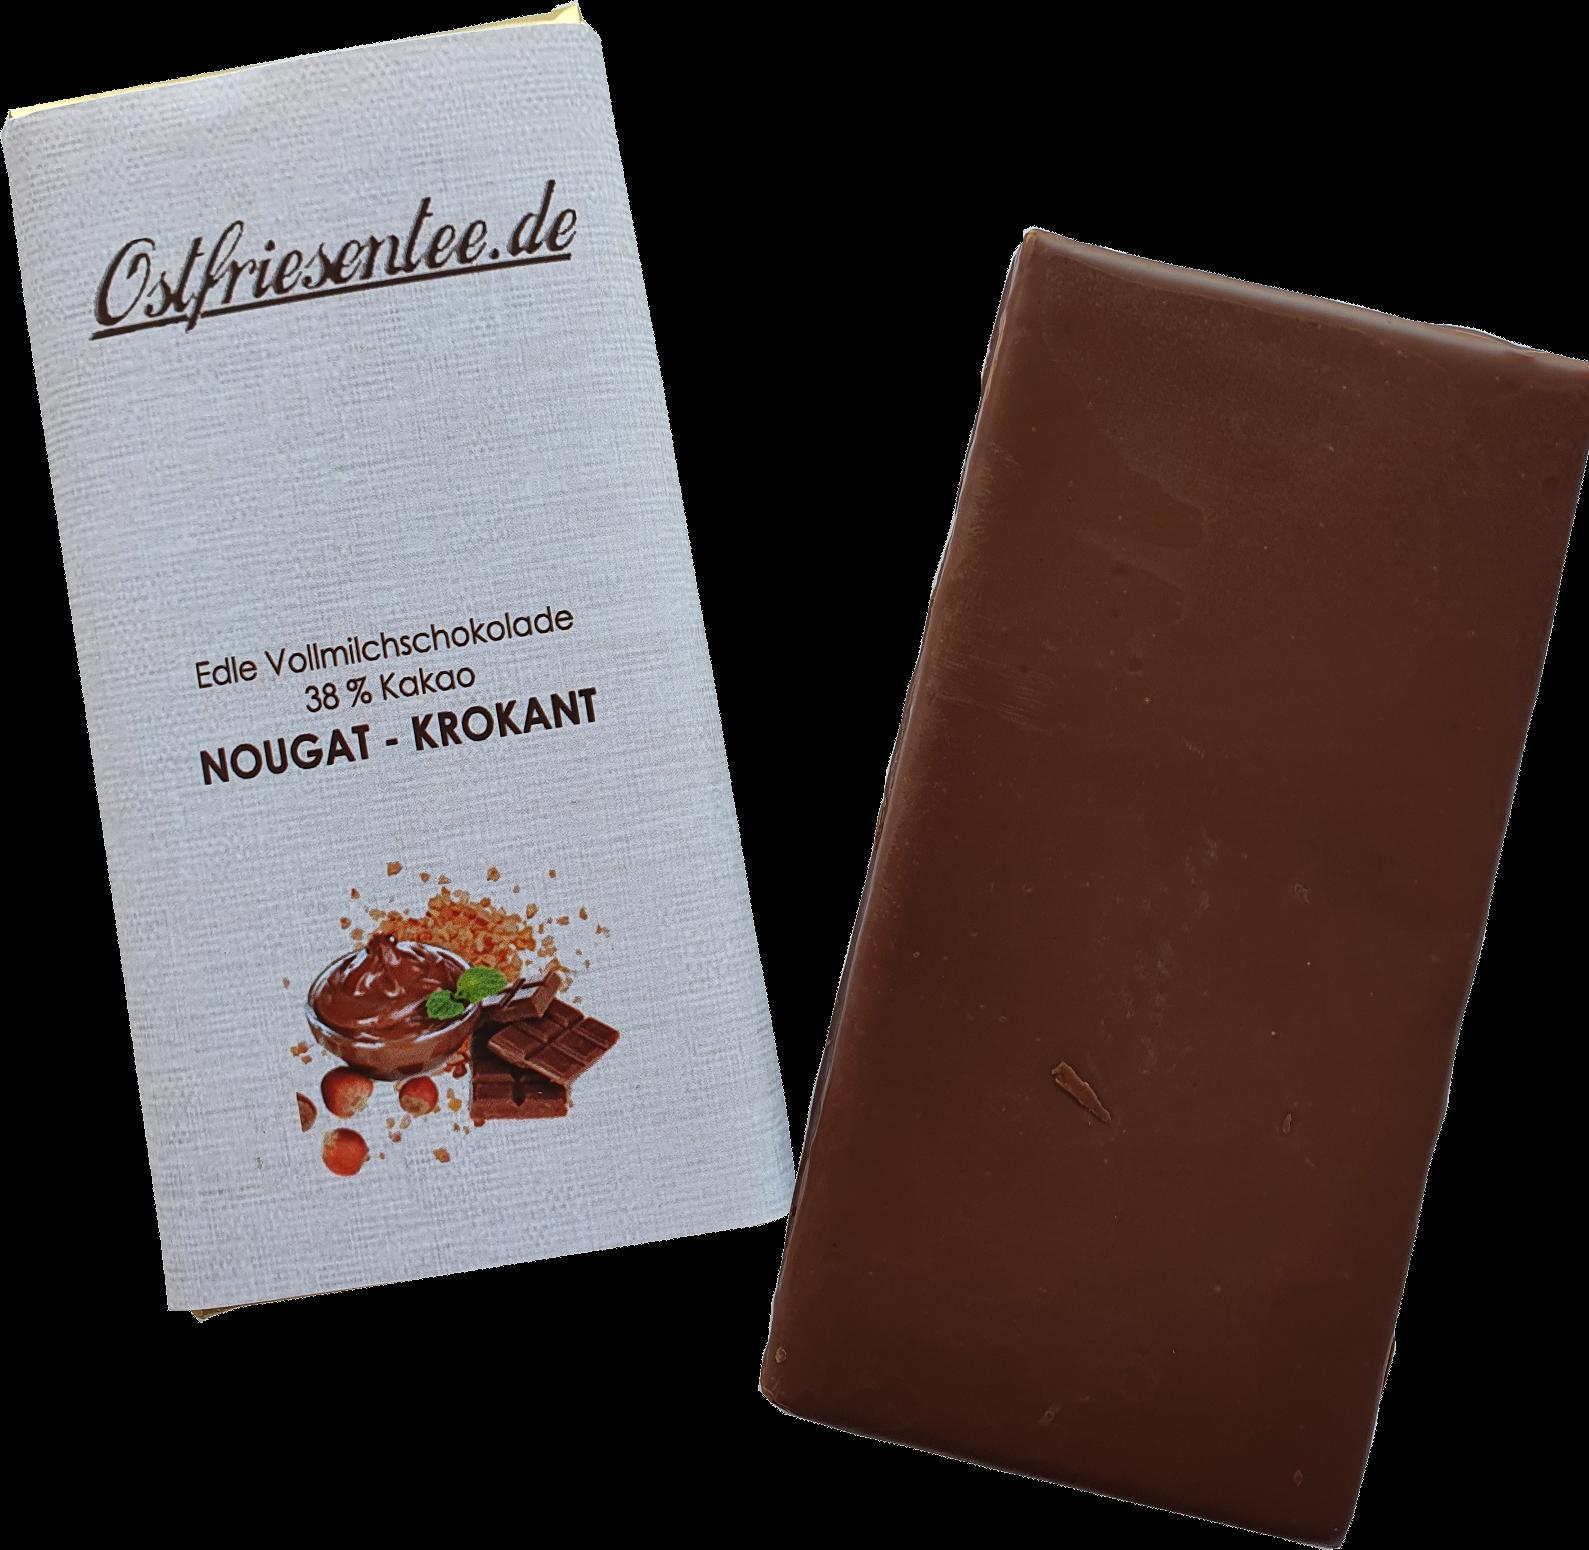 Nougat-Krokant Schokolade